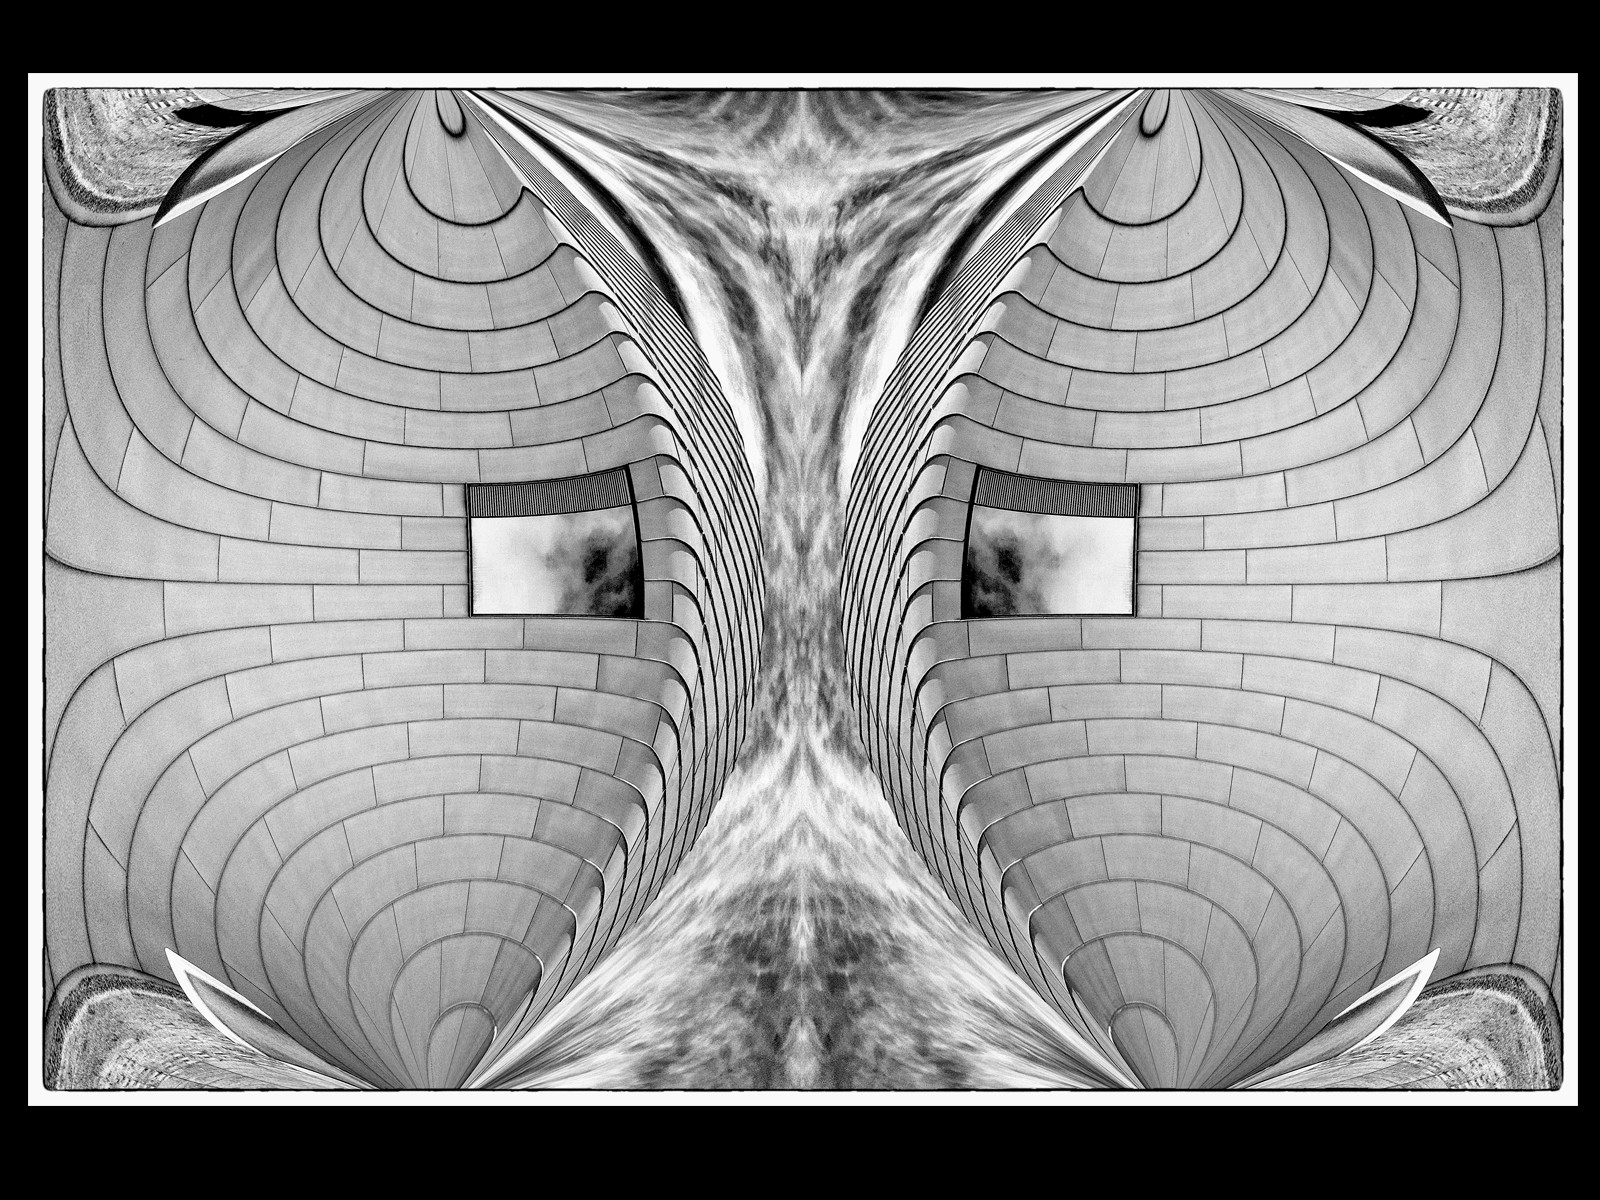 PDI - Eye to Eye by Brian Hennessy (12 marks)